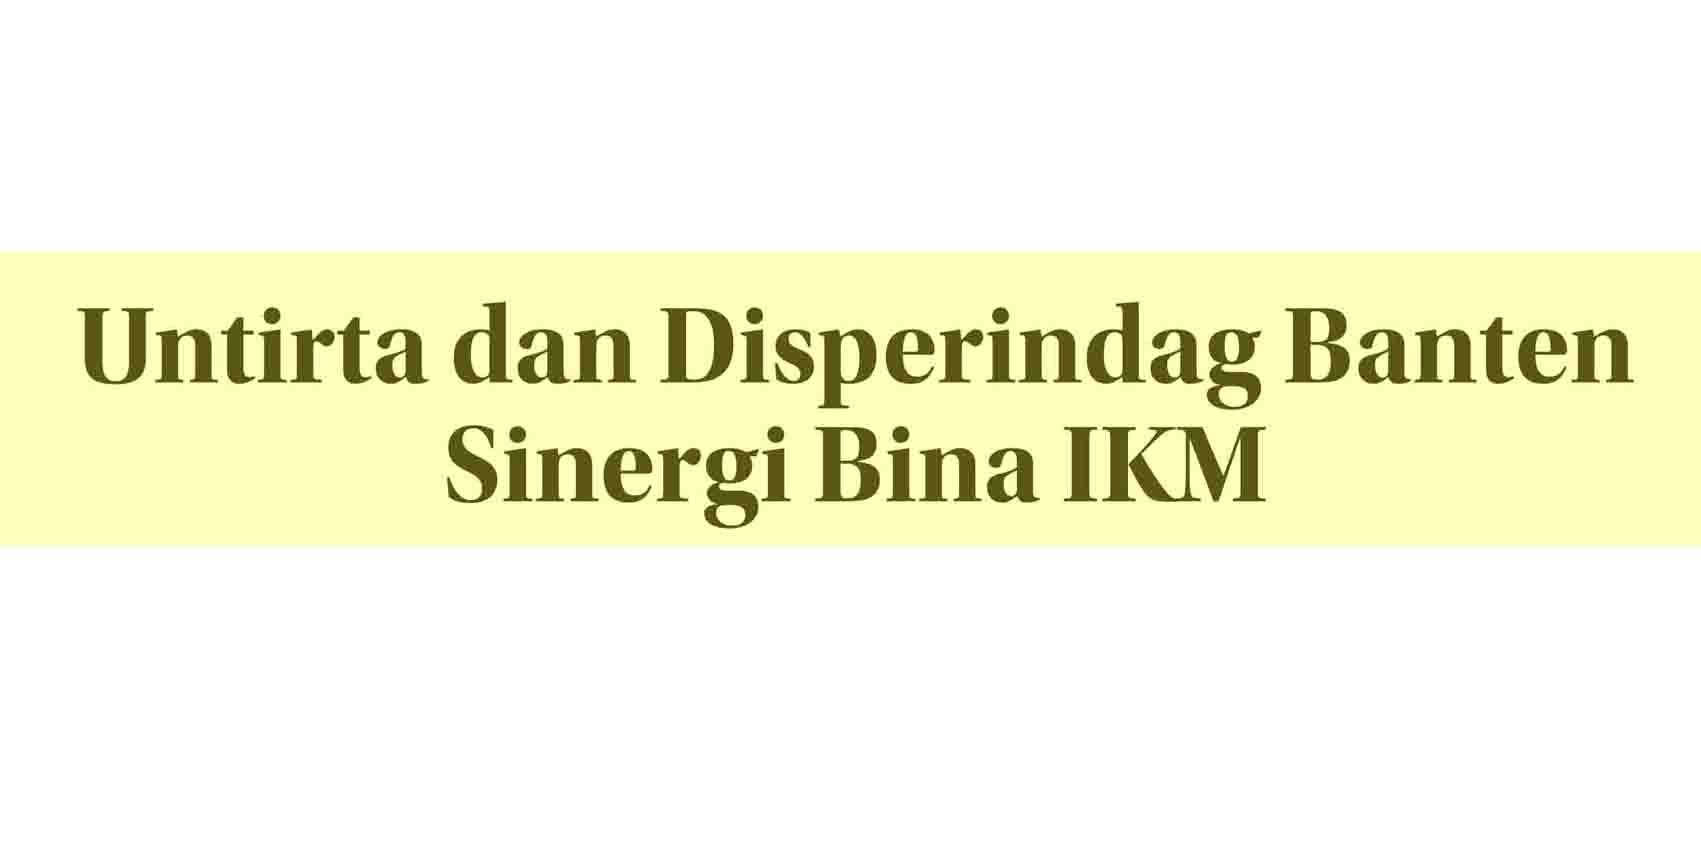 Untirta dan Disperindag Banten Sinergi Bina IKM